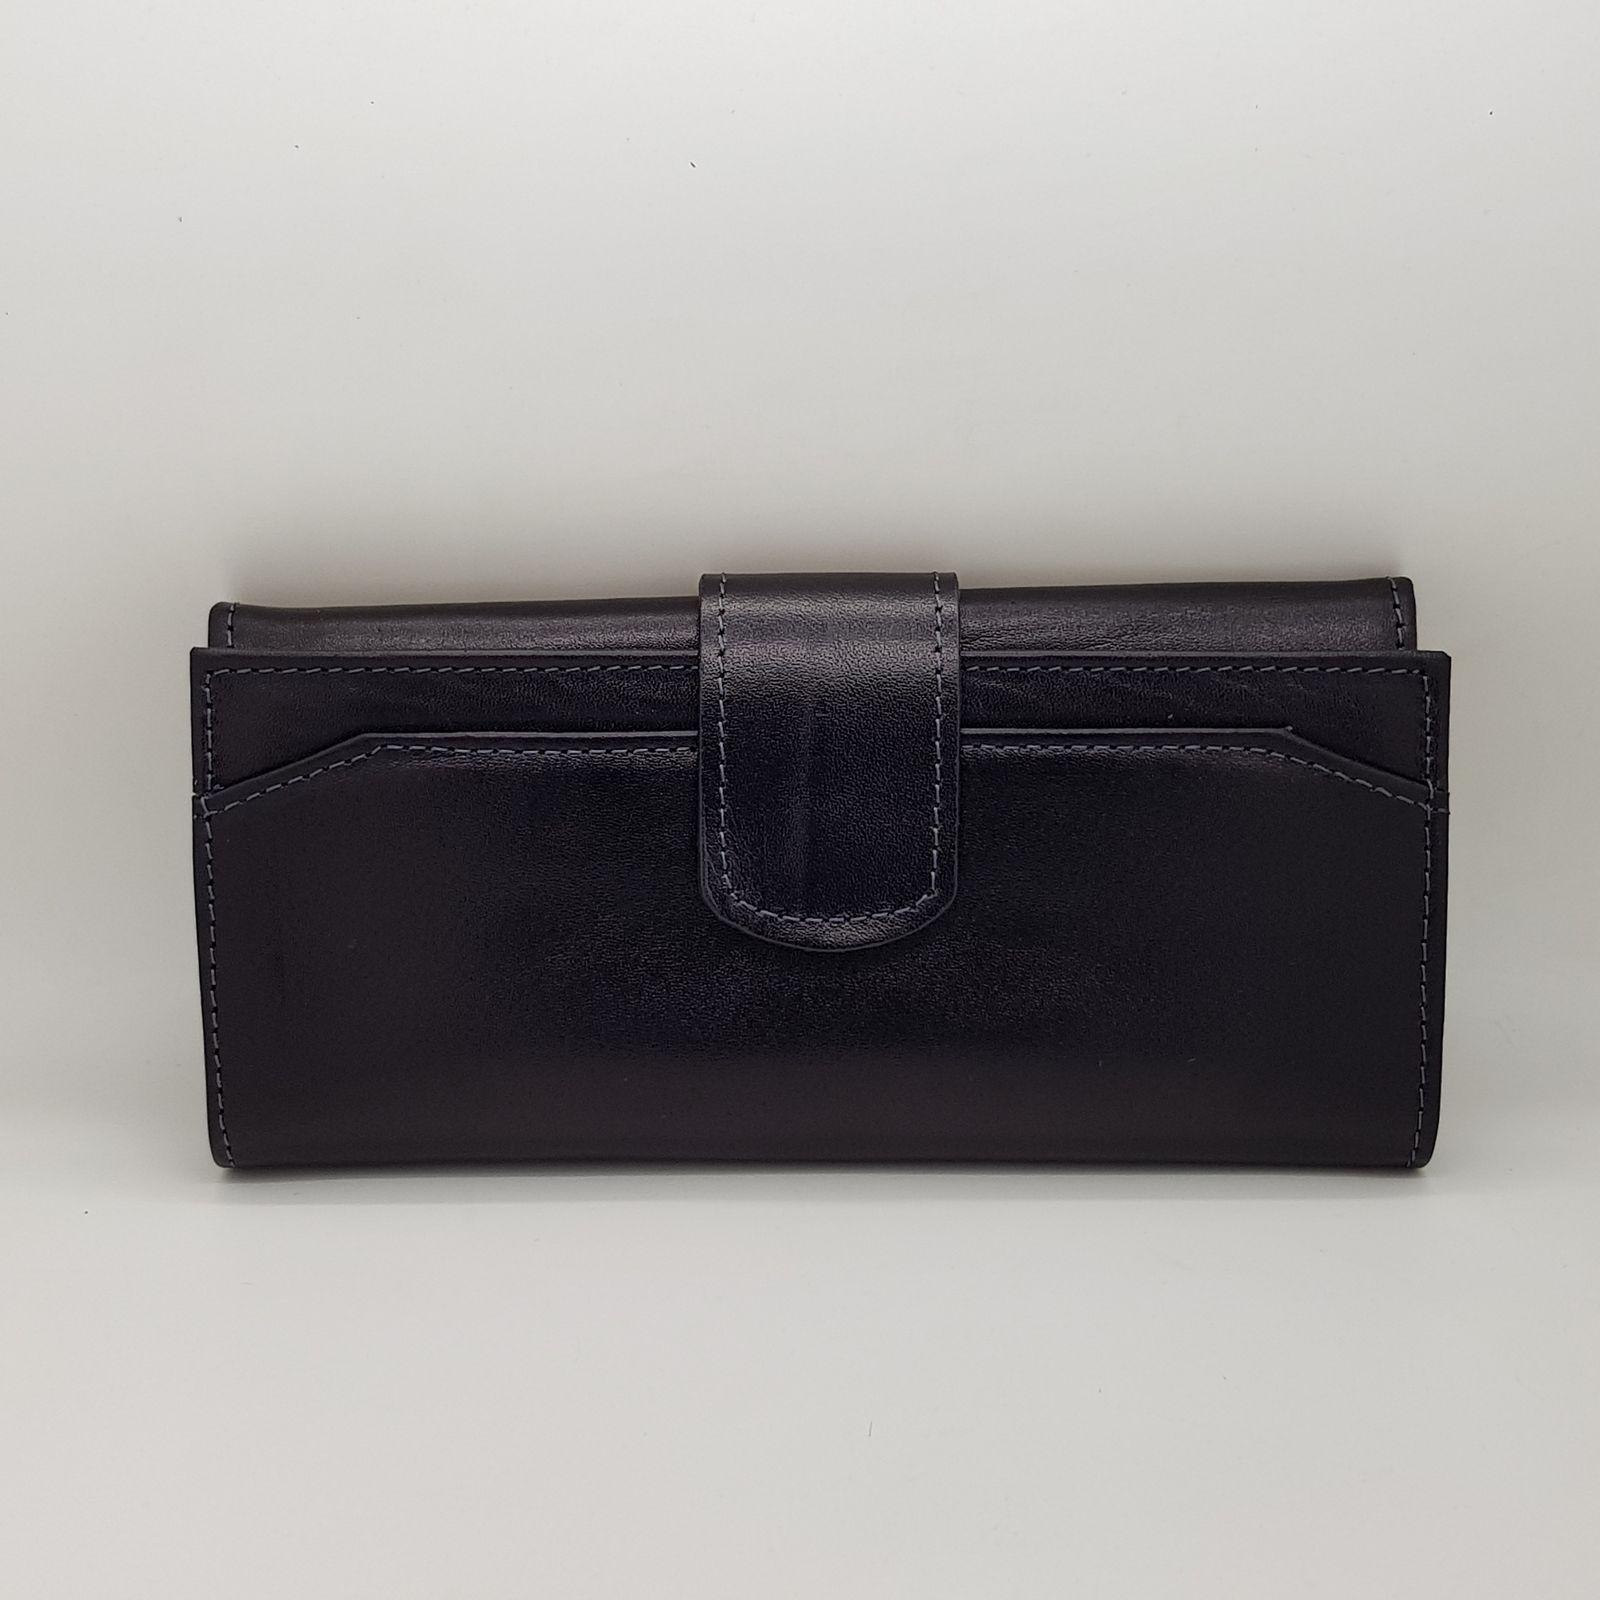 کیف پول زنانه چرم دیاکو مدل 315 -  - 3